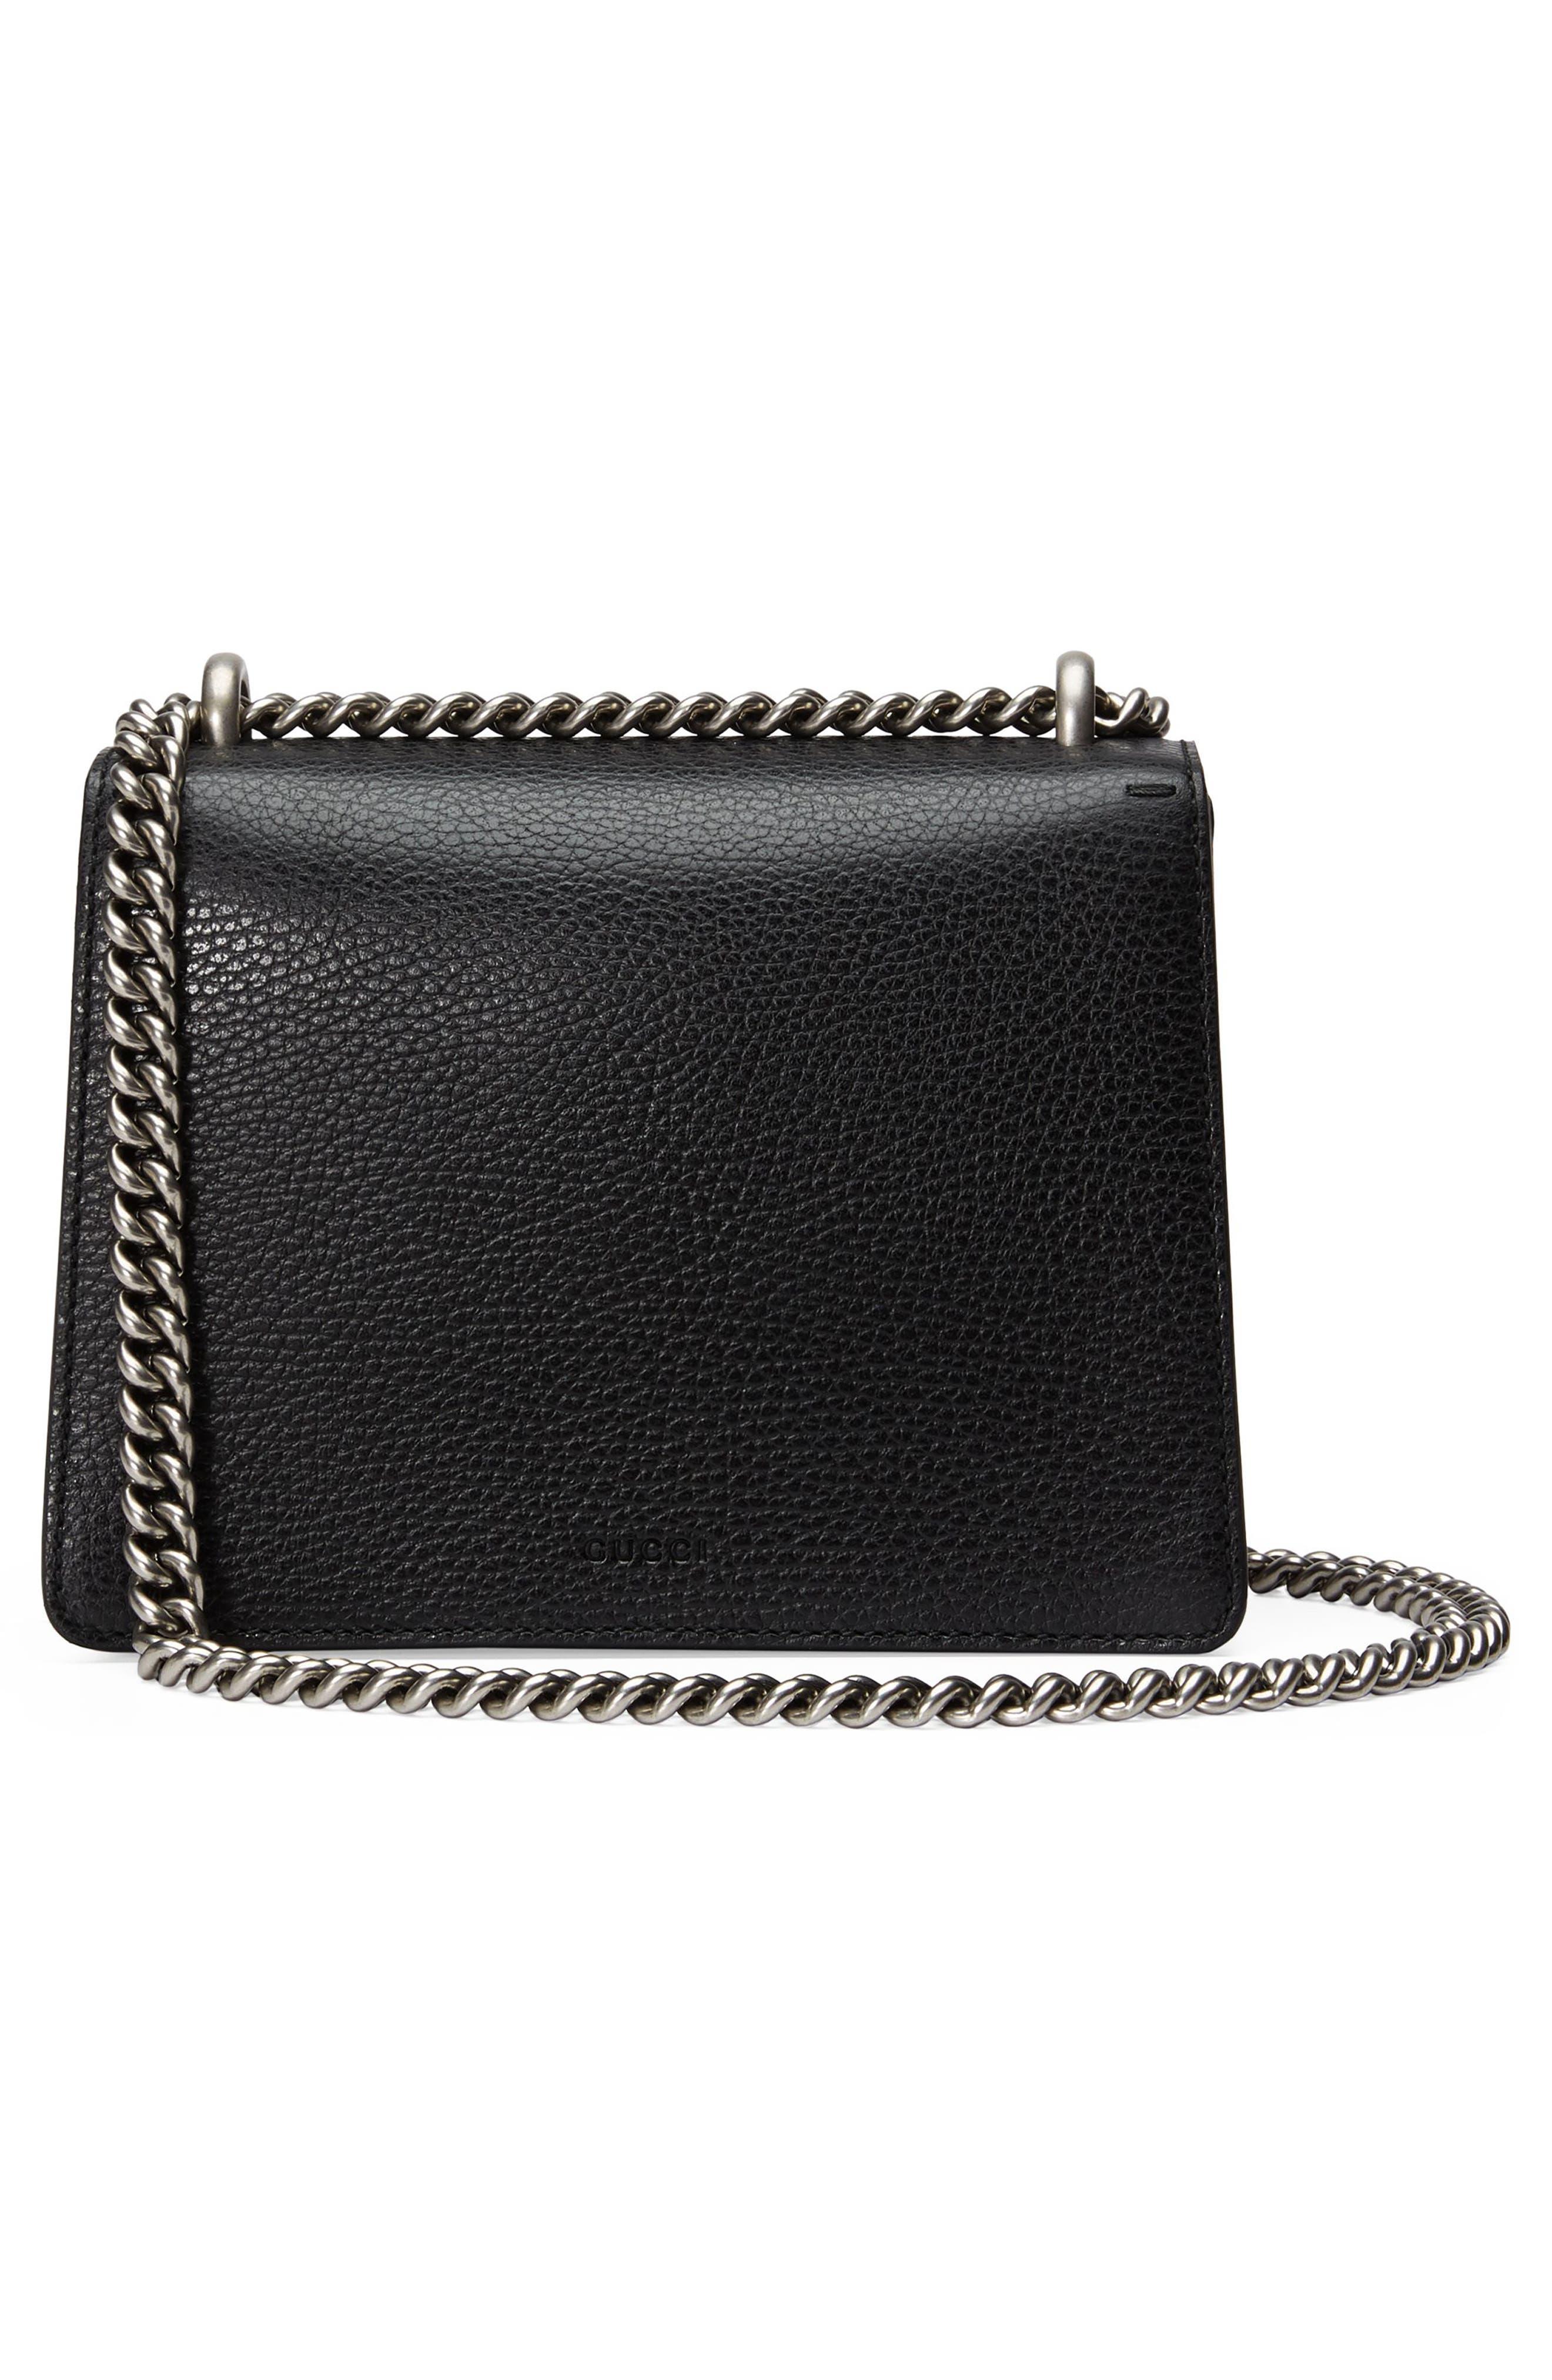 Mini Dionysus Leather Shoulder Bag,                             Alternate thumbnail 3, color,                             NERO/ BLACK DIAMOND